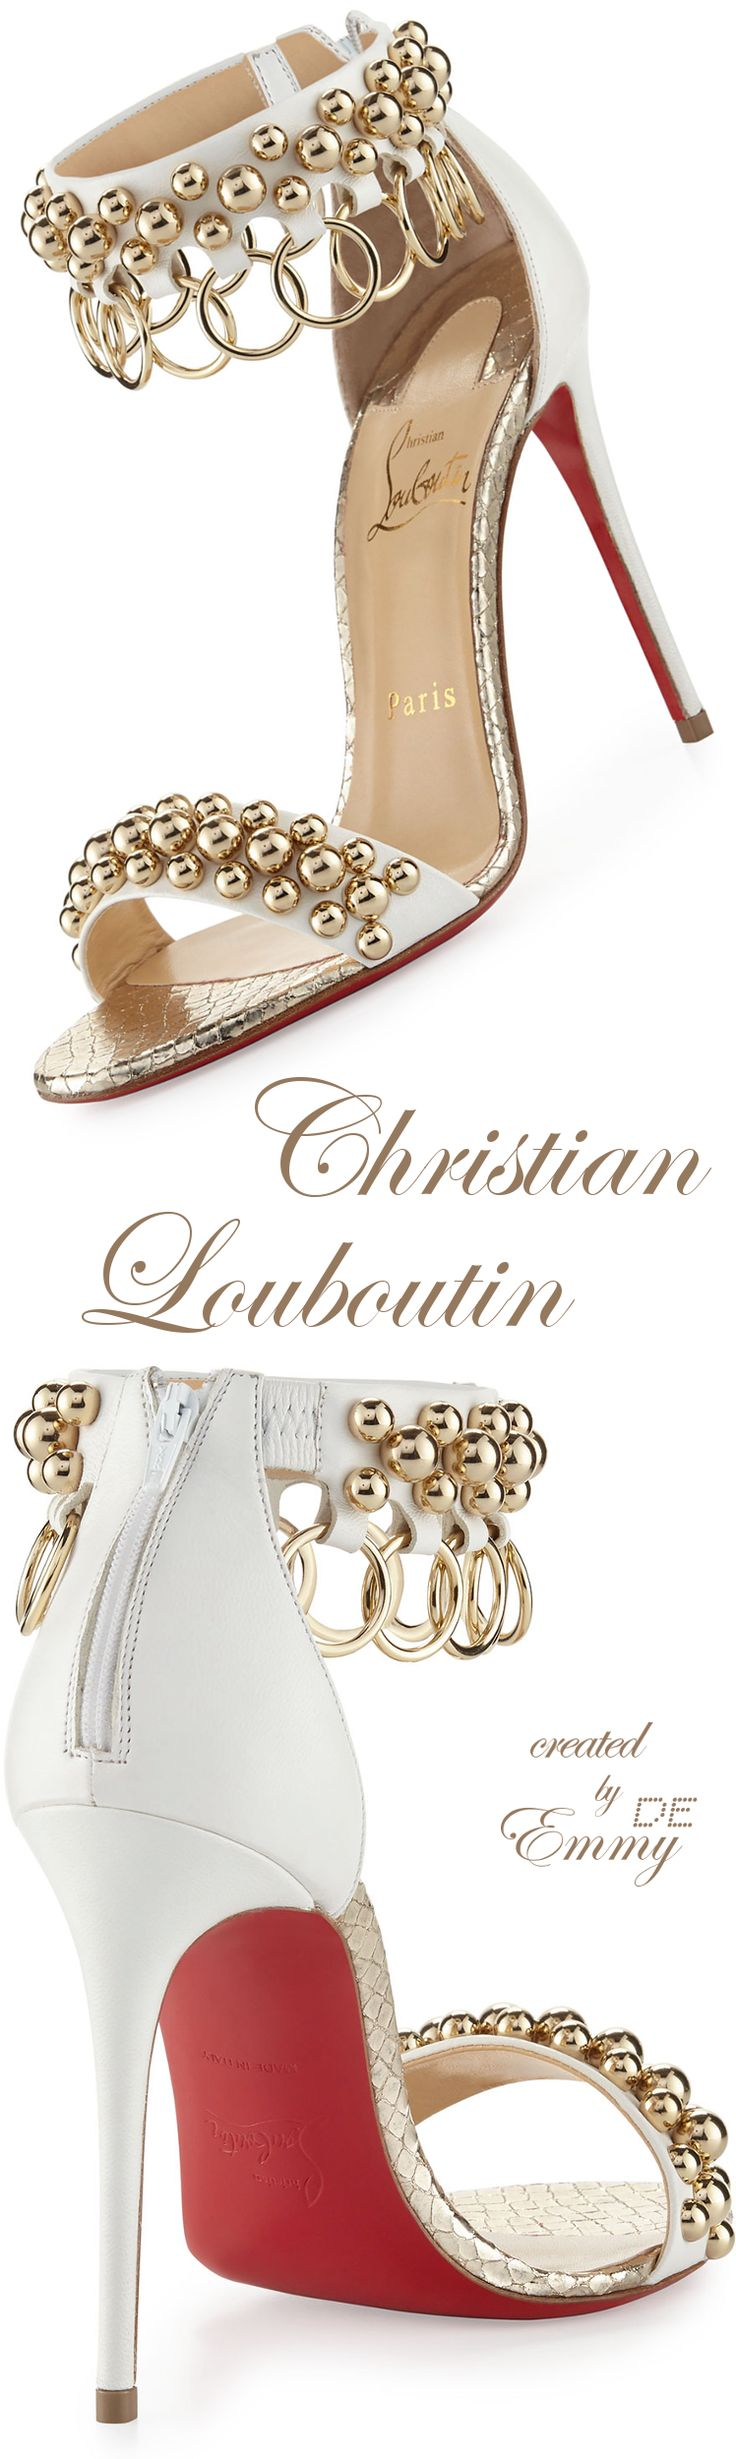 Emmy DE * Christian Louboutin 'Gypsandal' Ring-Trim Red Sole Sandal